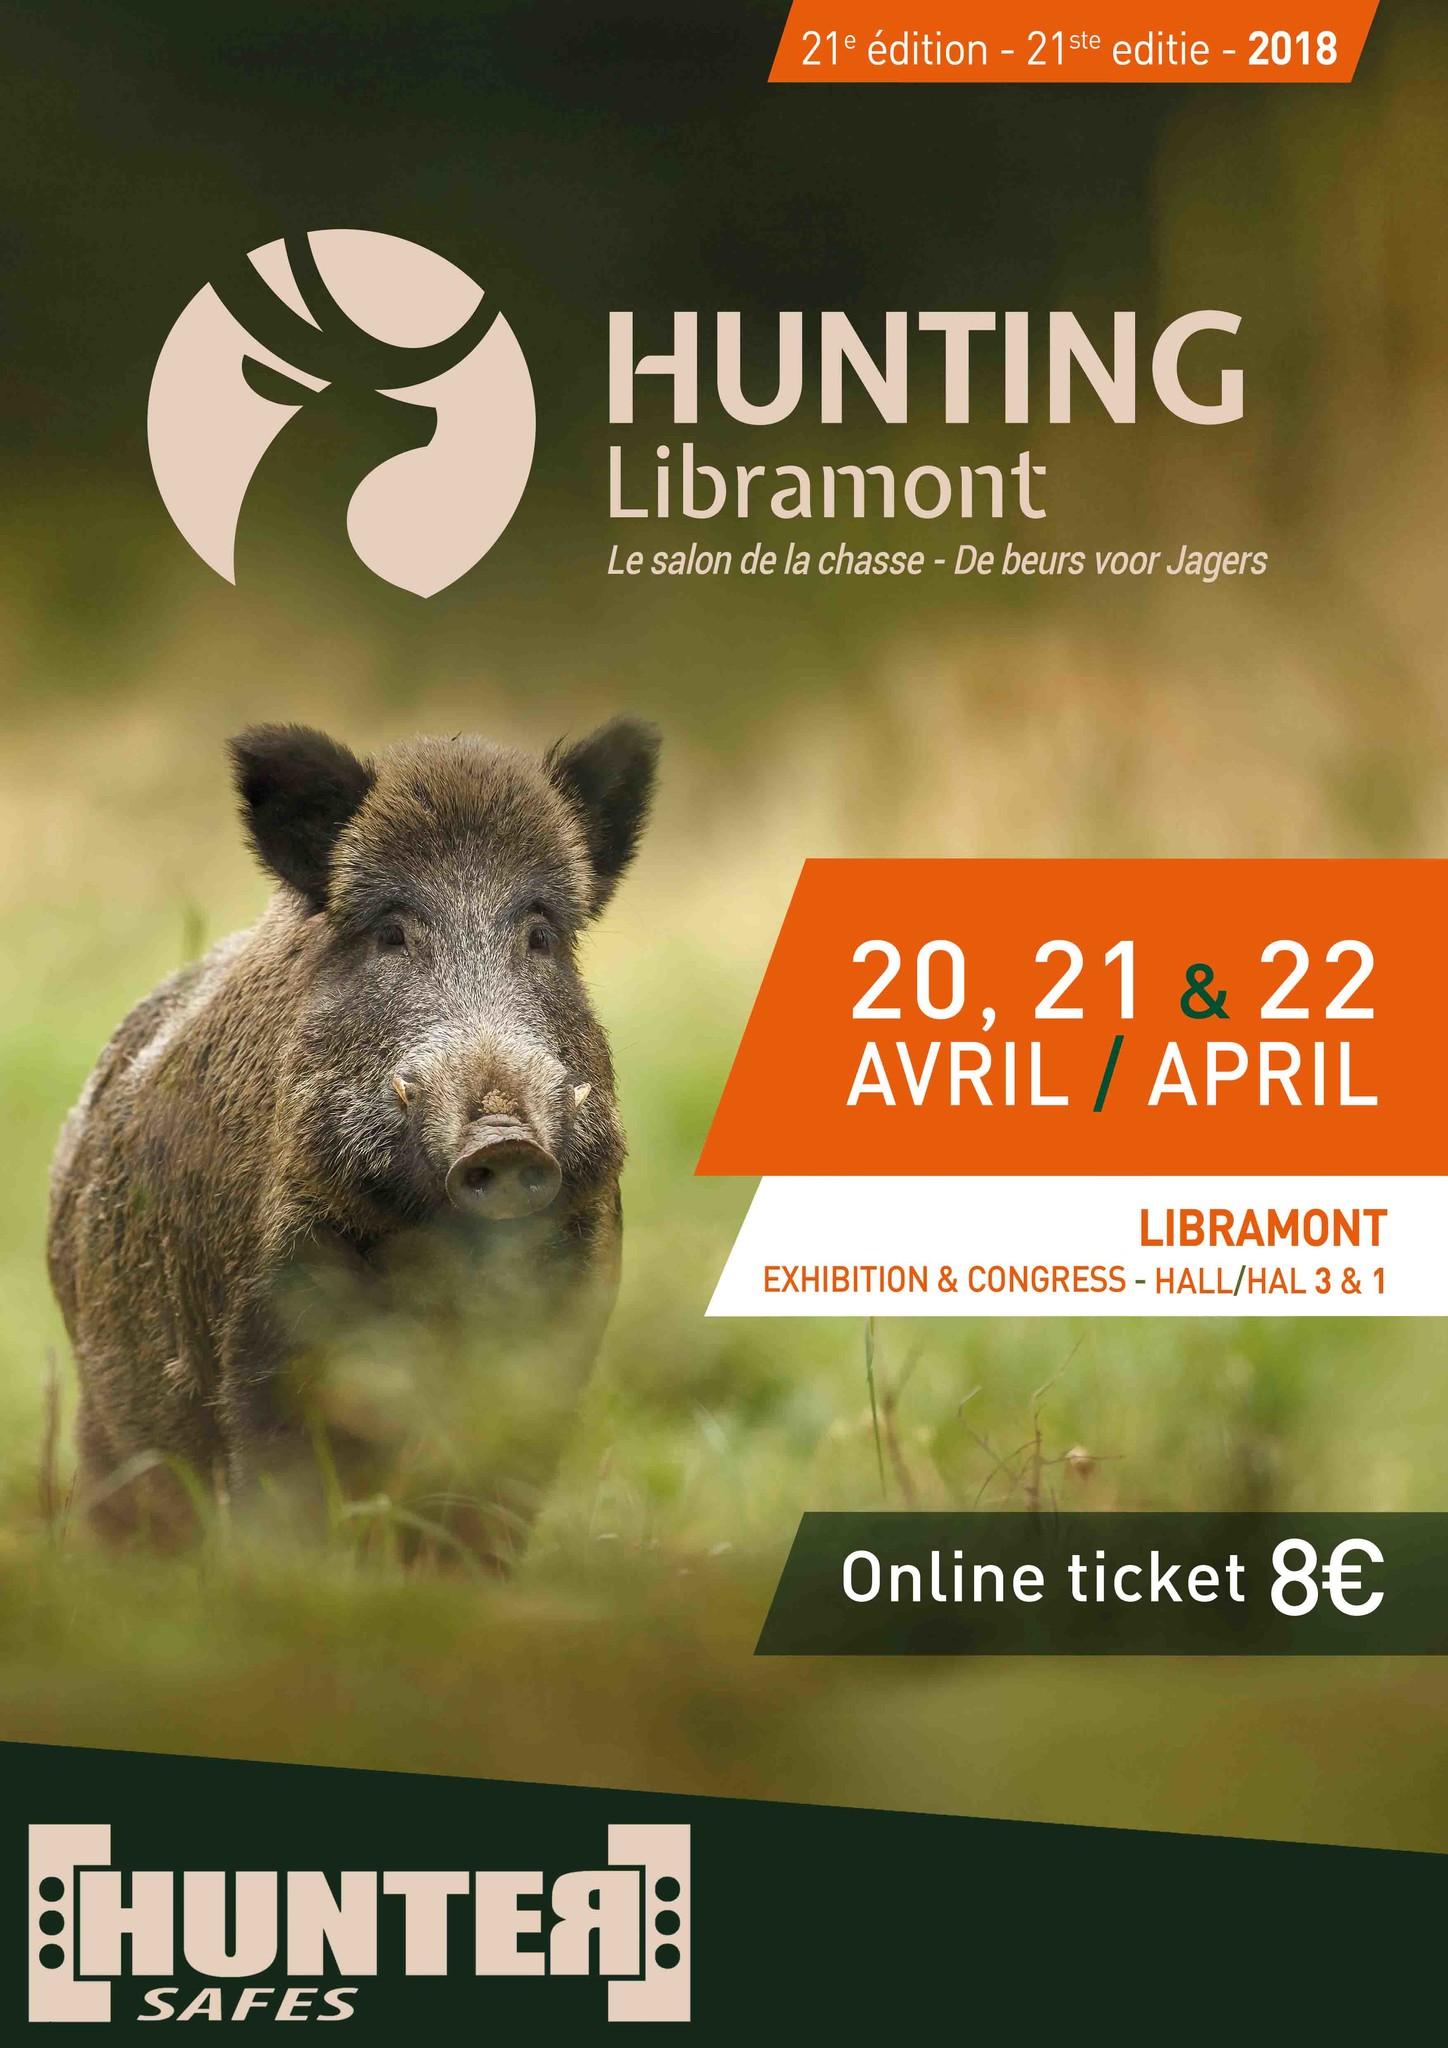 Hunting Libramont Hunter Safes